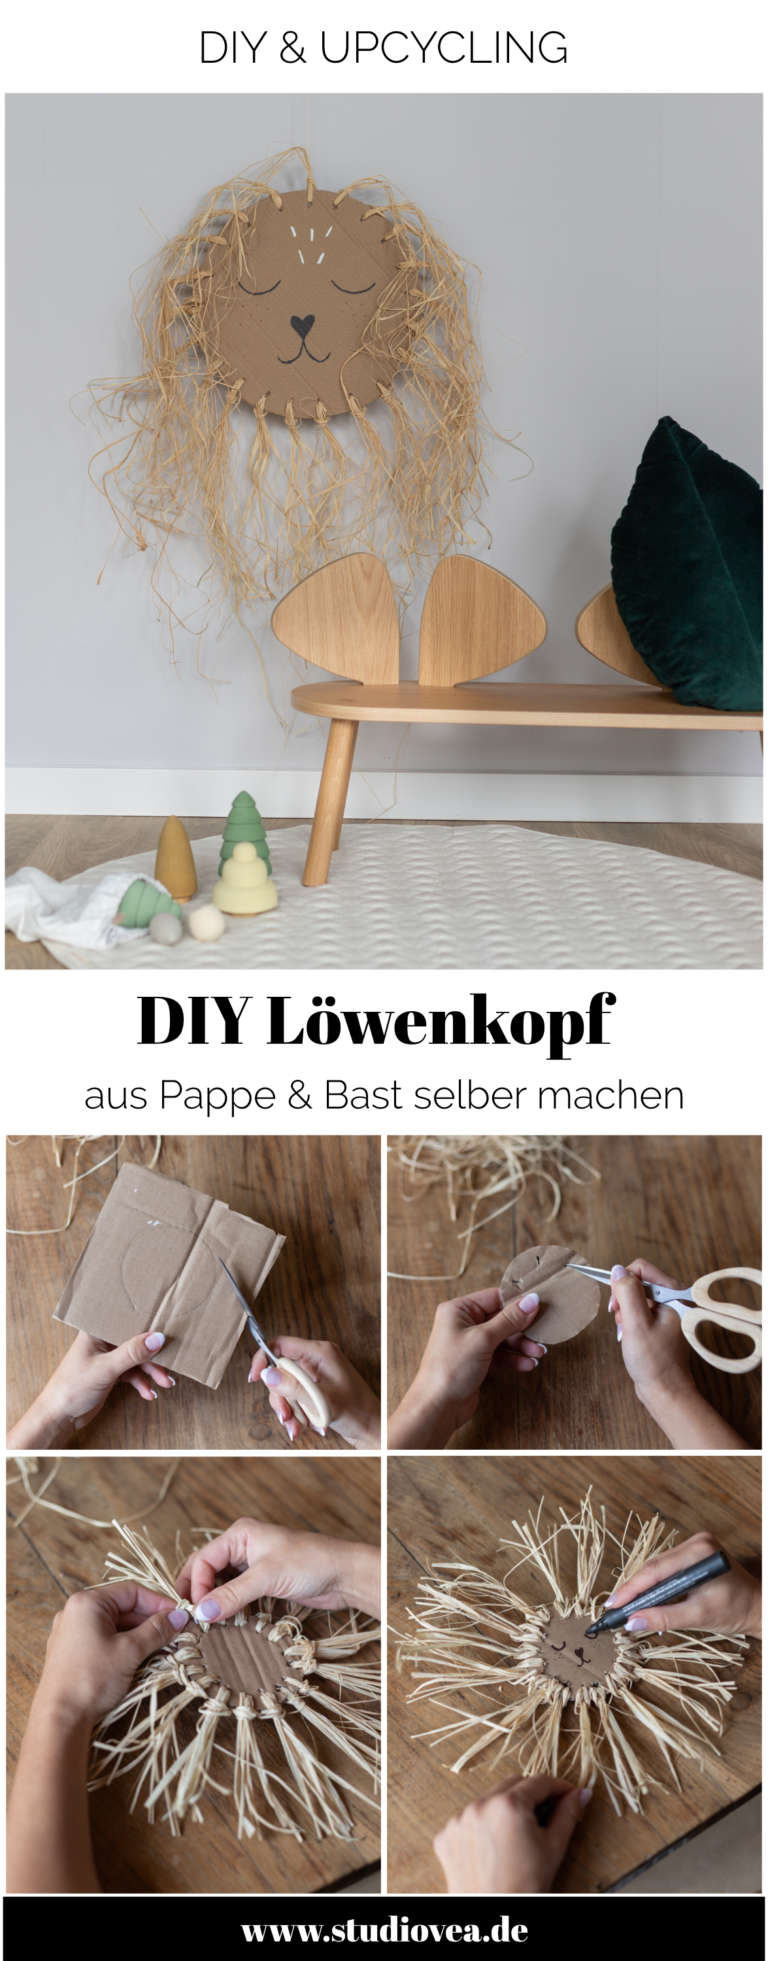 Anleitung DIY Idee Pappe Karton Upcycling Lowe Kinderzimmer Wanddeko Dekoration Bast studiovea